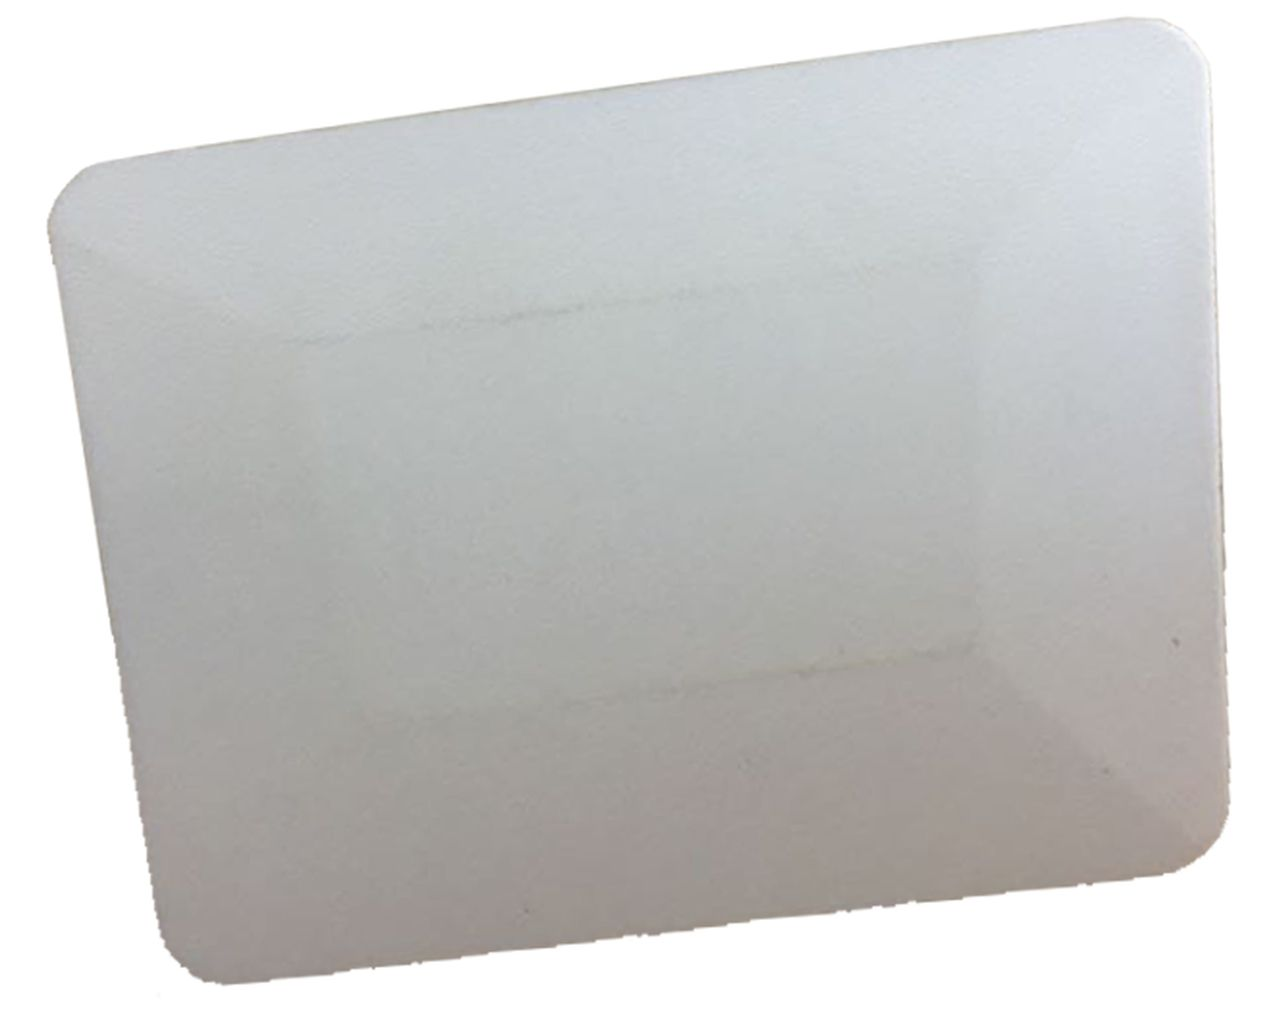 Película Tintada de controle solar TLV 5, 20, 35, 50. Cores disponíveis: Charcoal, Preto,  Verde Oliva, verde floresta e Grafite(1 rolo X 30 Metros)